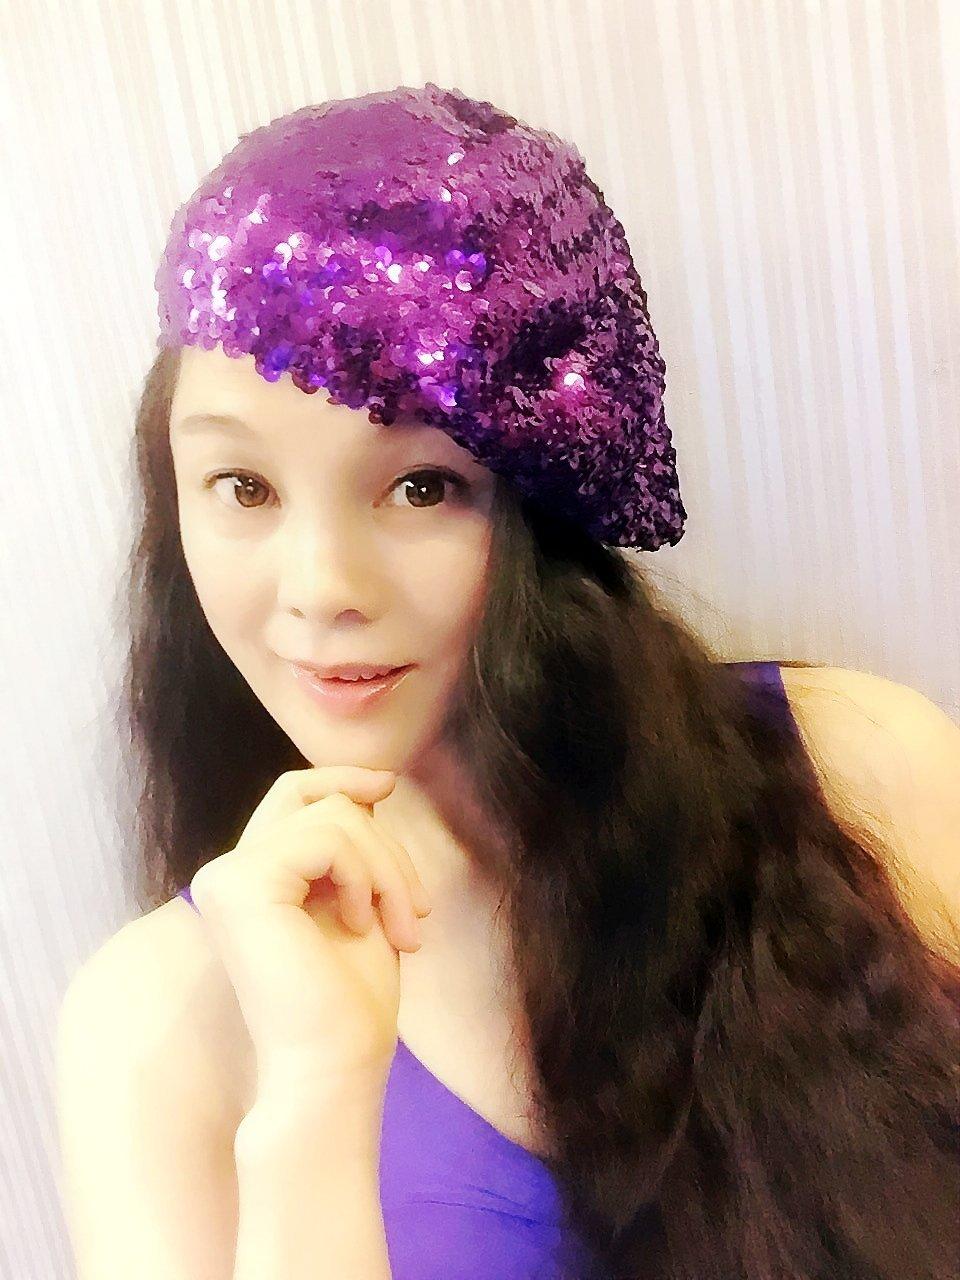 Purple Sequin Beret,Womens Turban,Full Turban,Turban Headband,Turban Hat,Stretch Turban, Caps, Hats, Women Hats,Fashion Turban,Head Wrap,Head Scarf,Headband,Hipster,Fashion,Gift ,Show, Party ,Holiday